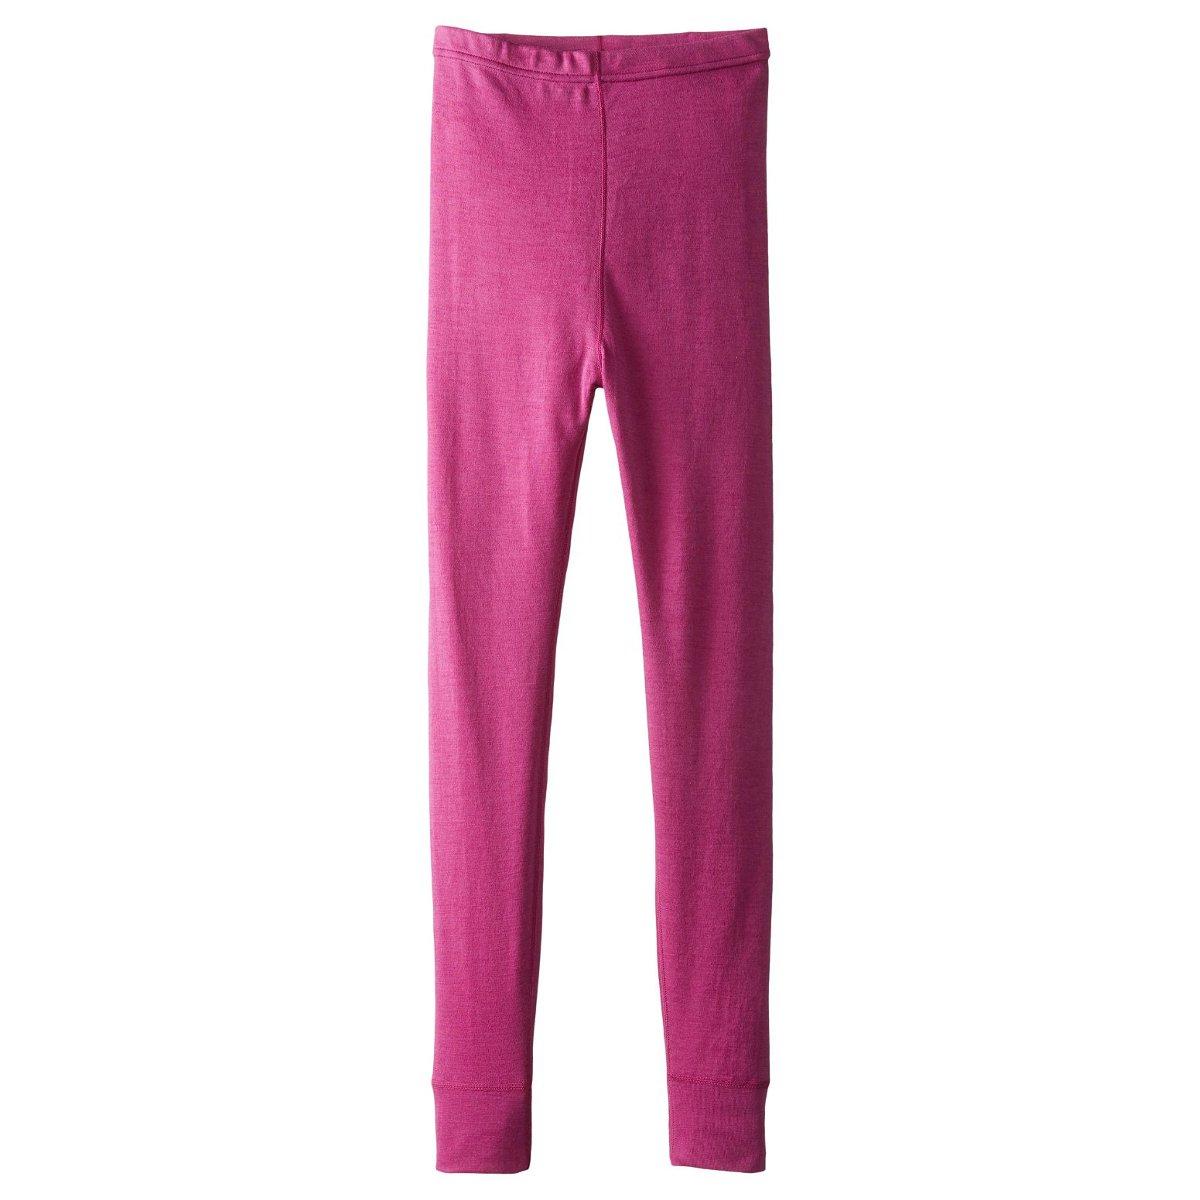 Minus33 Merino Wool 5800 Blossom Girls Midweight Bottom - Anti Odor No Itch Renewable Fabric